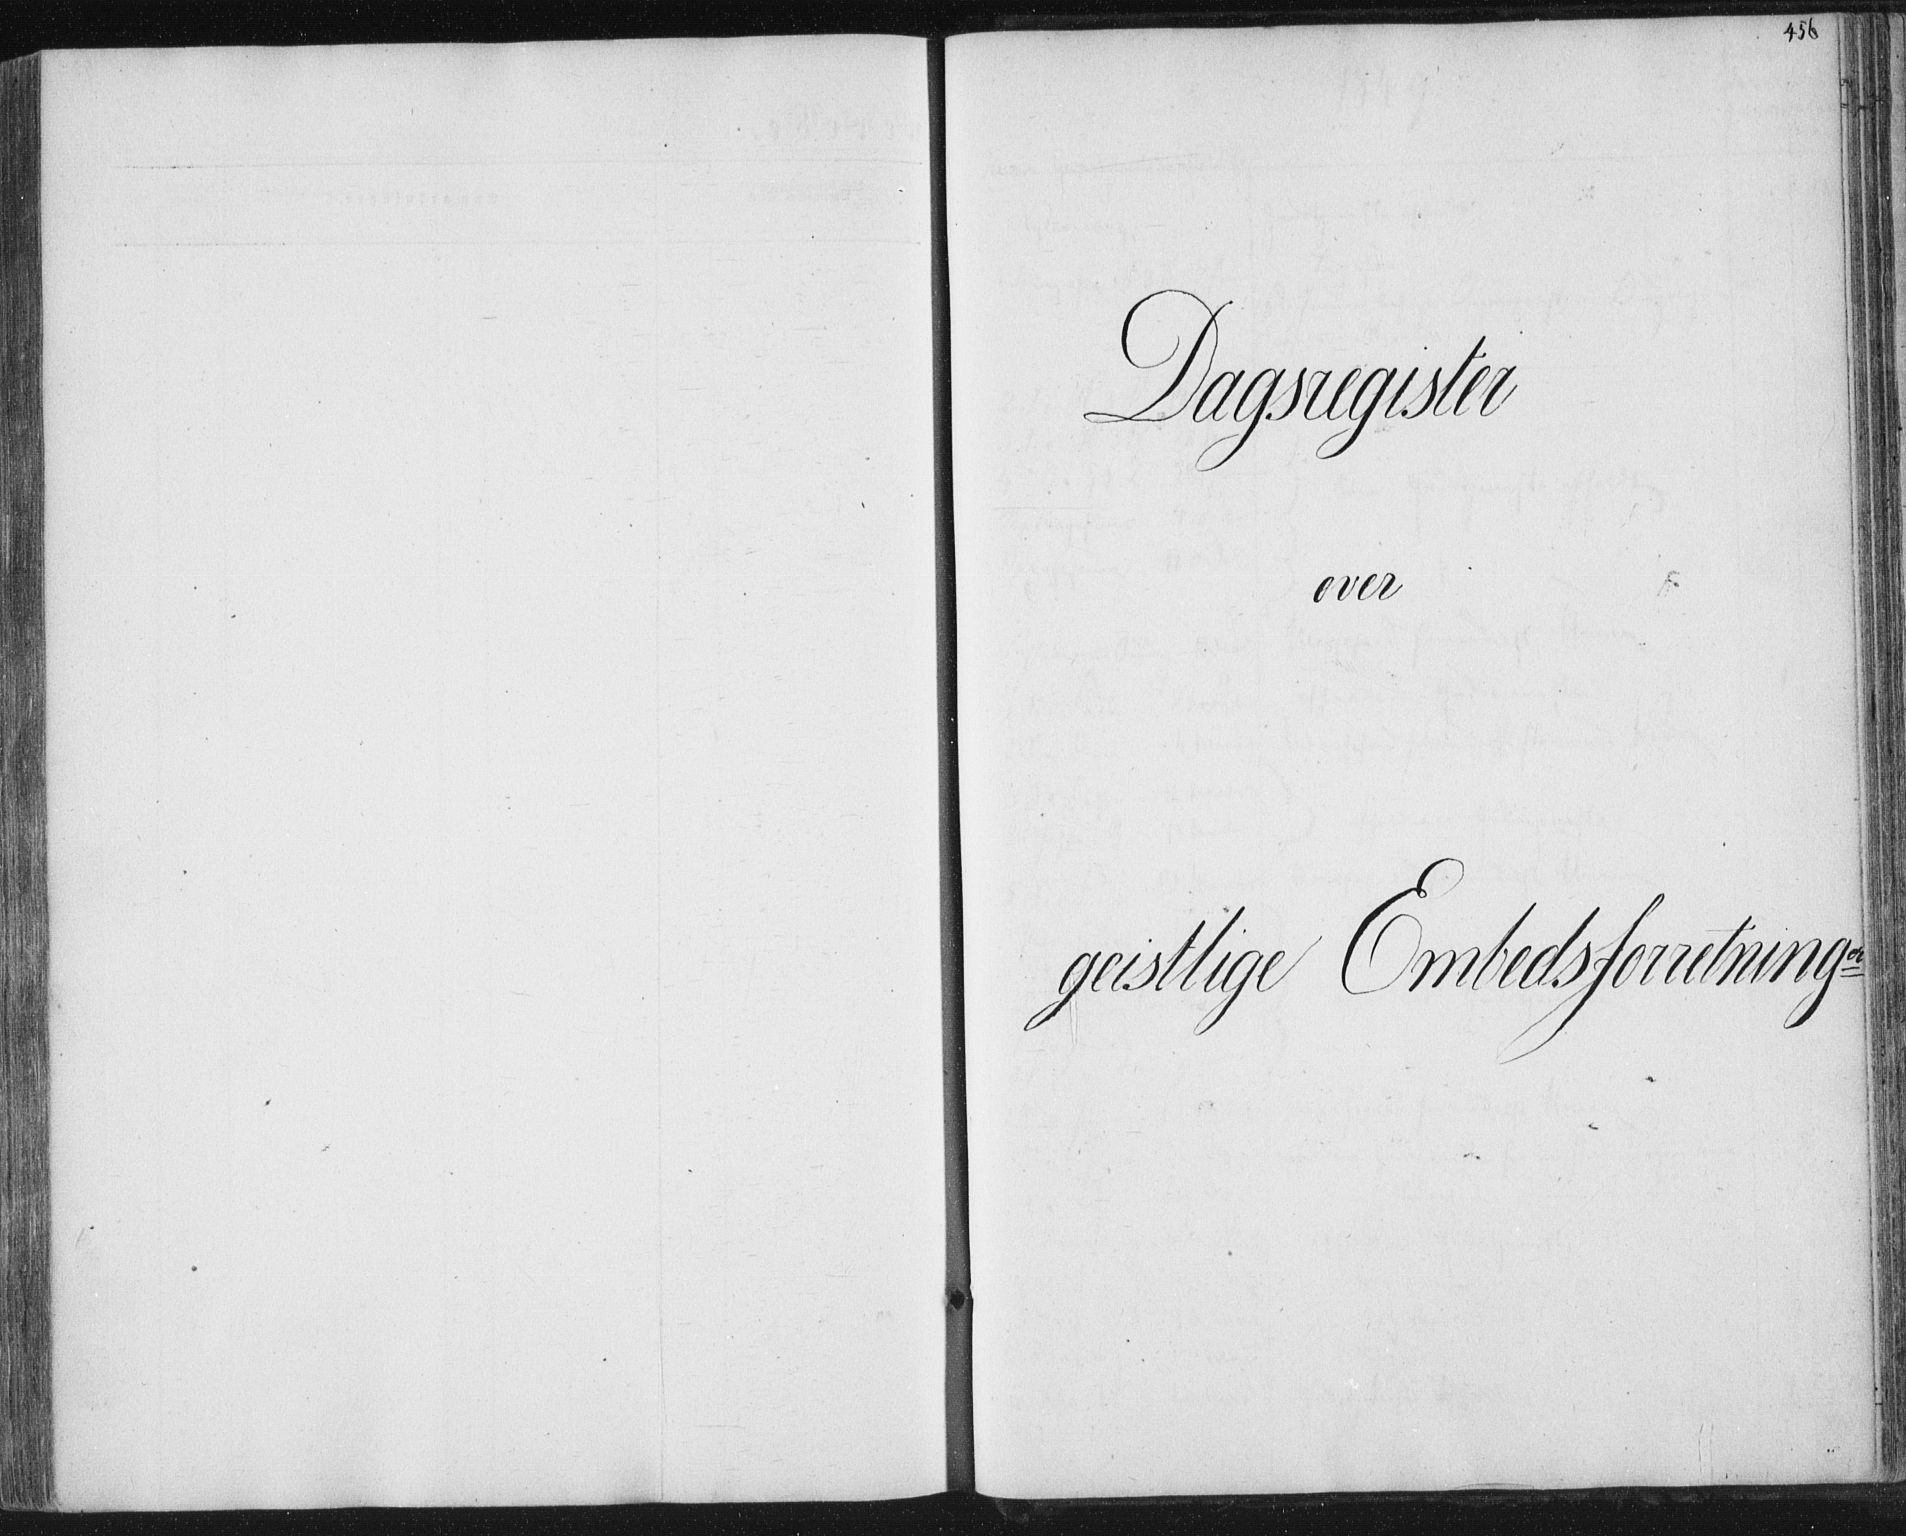 SAT, Ministerialprotokoller, klokkerbøker og fødselsregistre - Nordland, 852/L0738: Ministerialbok nr. 852A08, 1849-1865, s. 456